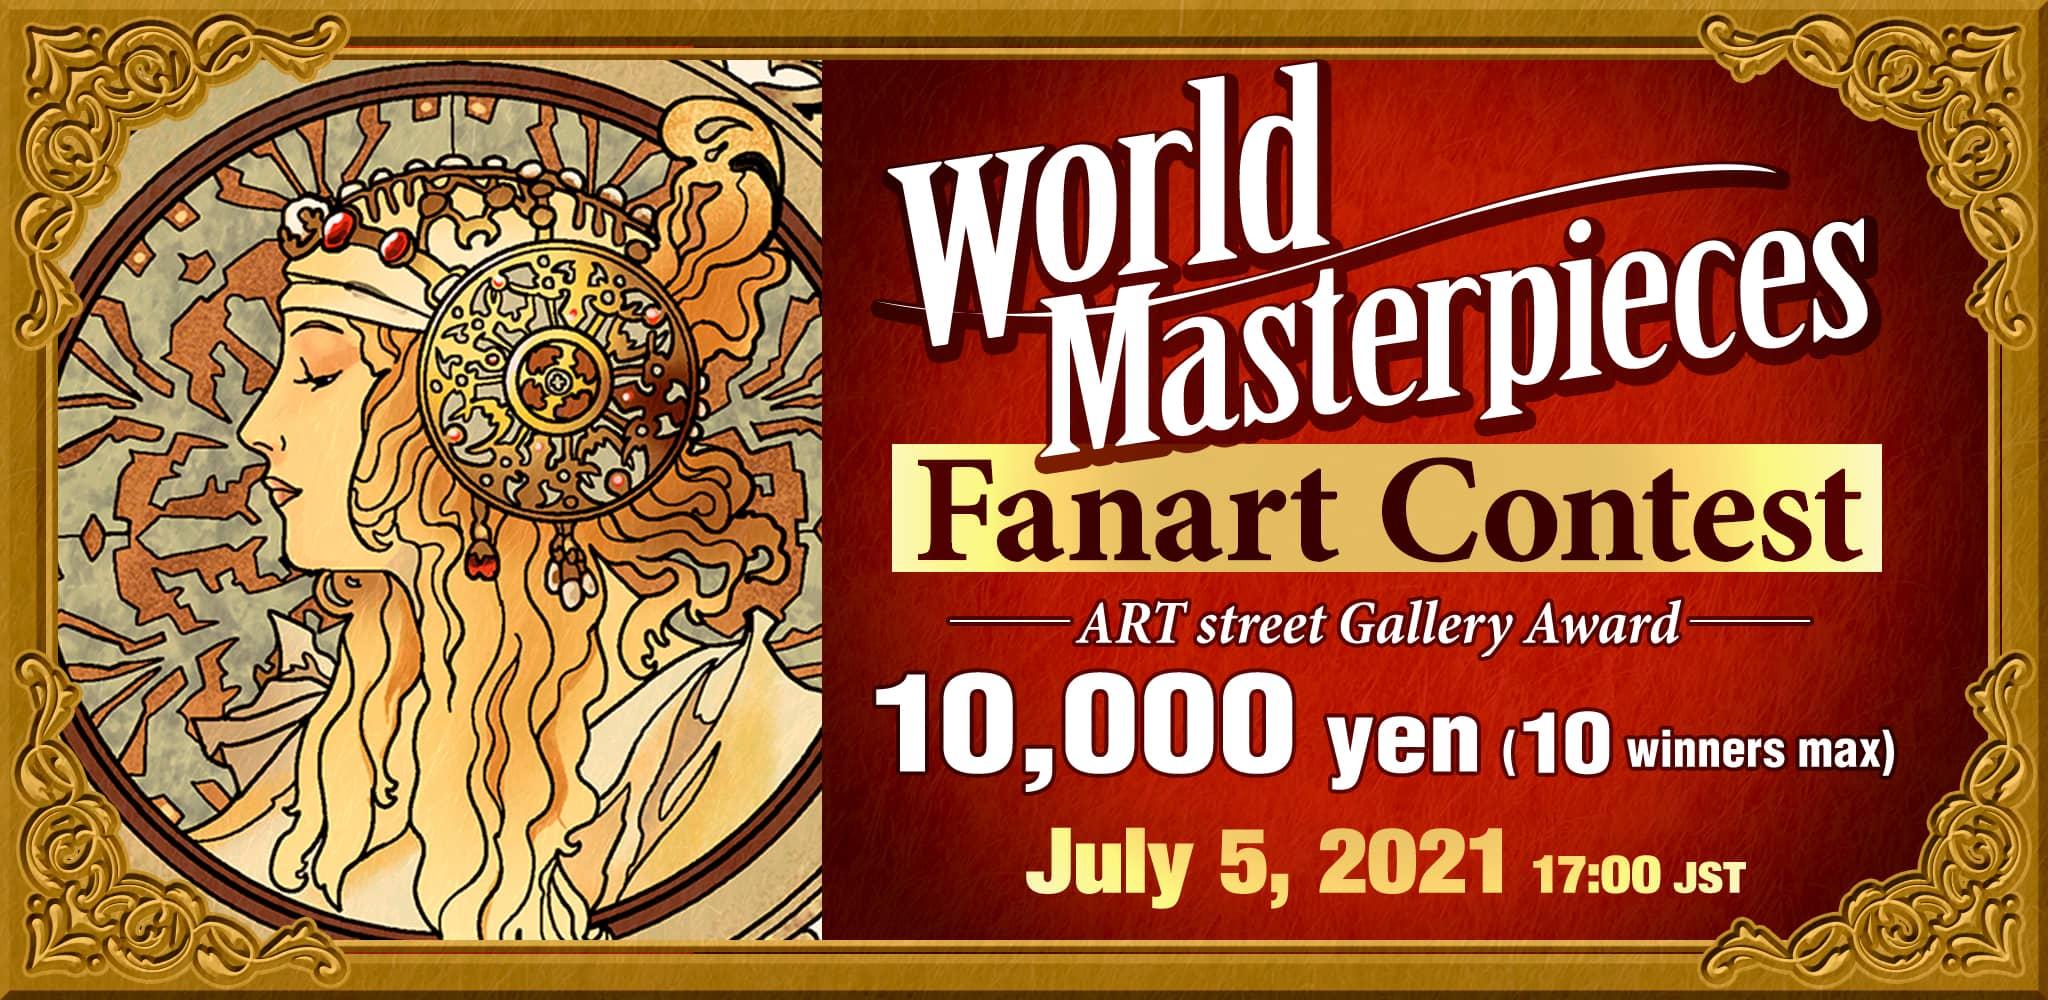 World Masterpieces Fanart Contest